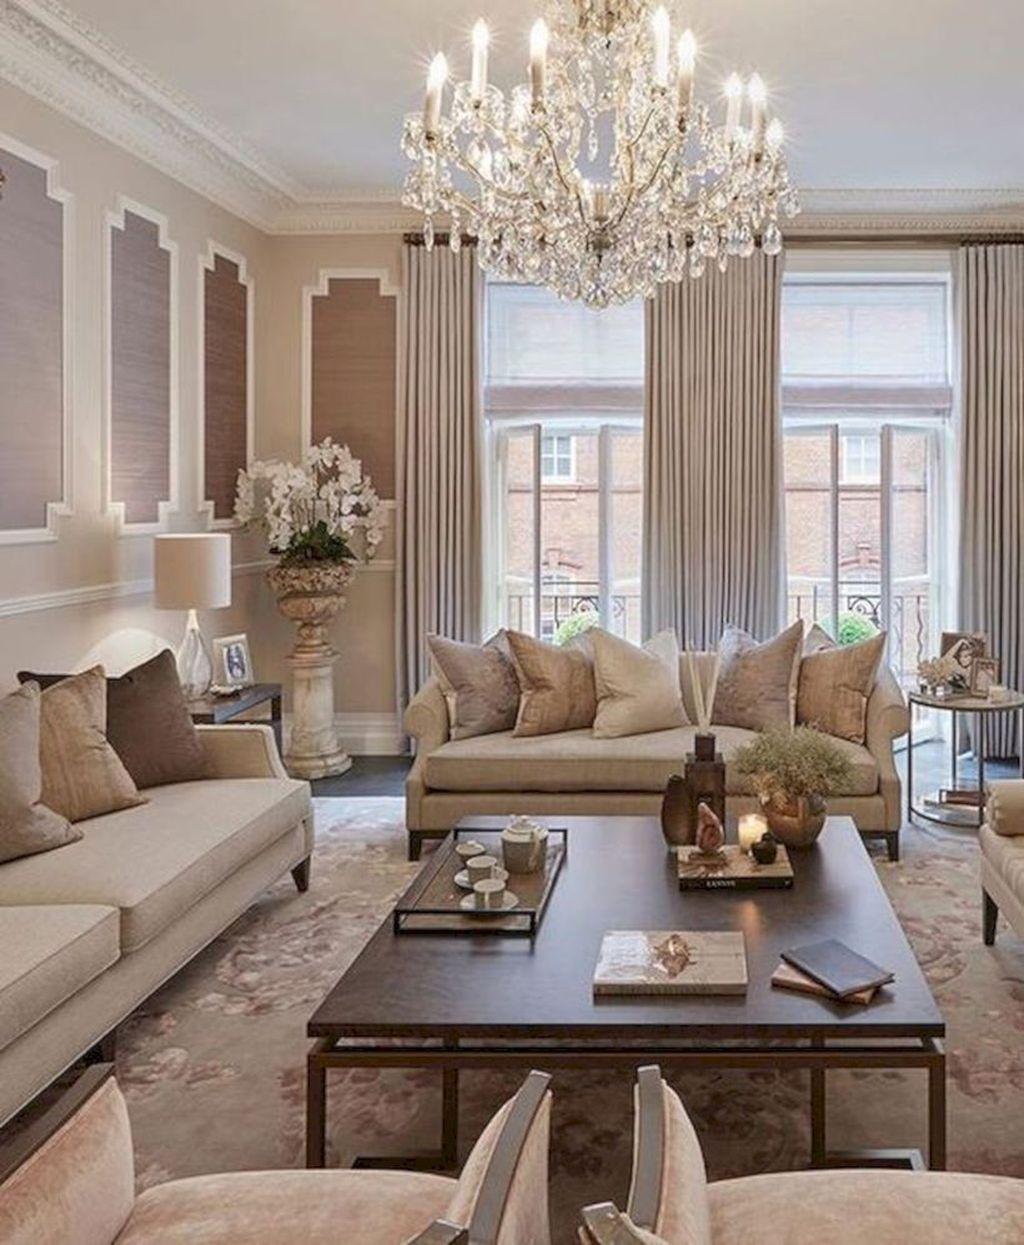 Luxury Living Room Design Ideas 2020 In 2020 Elegant Living Room Decor Living Room Decor Apartment Living Room Design Modern